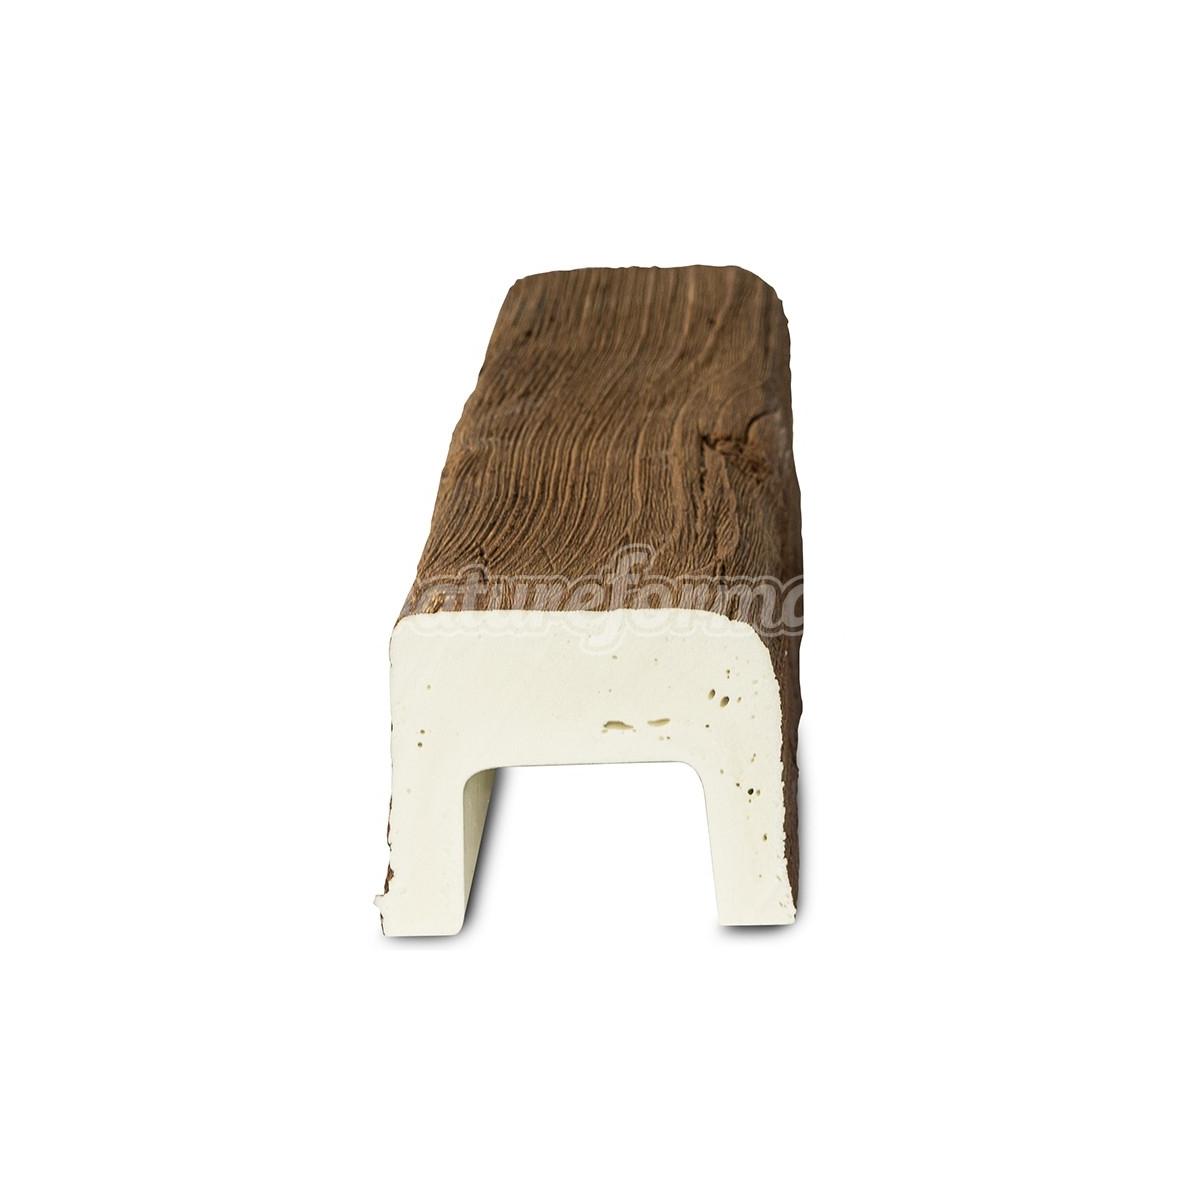 Viga imitación a madera 300x7x5,5 - Vigas imitación madera cuadradas